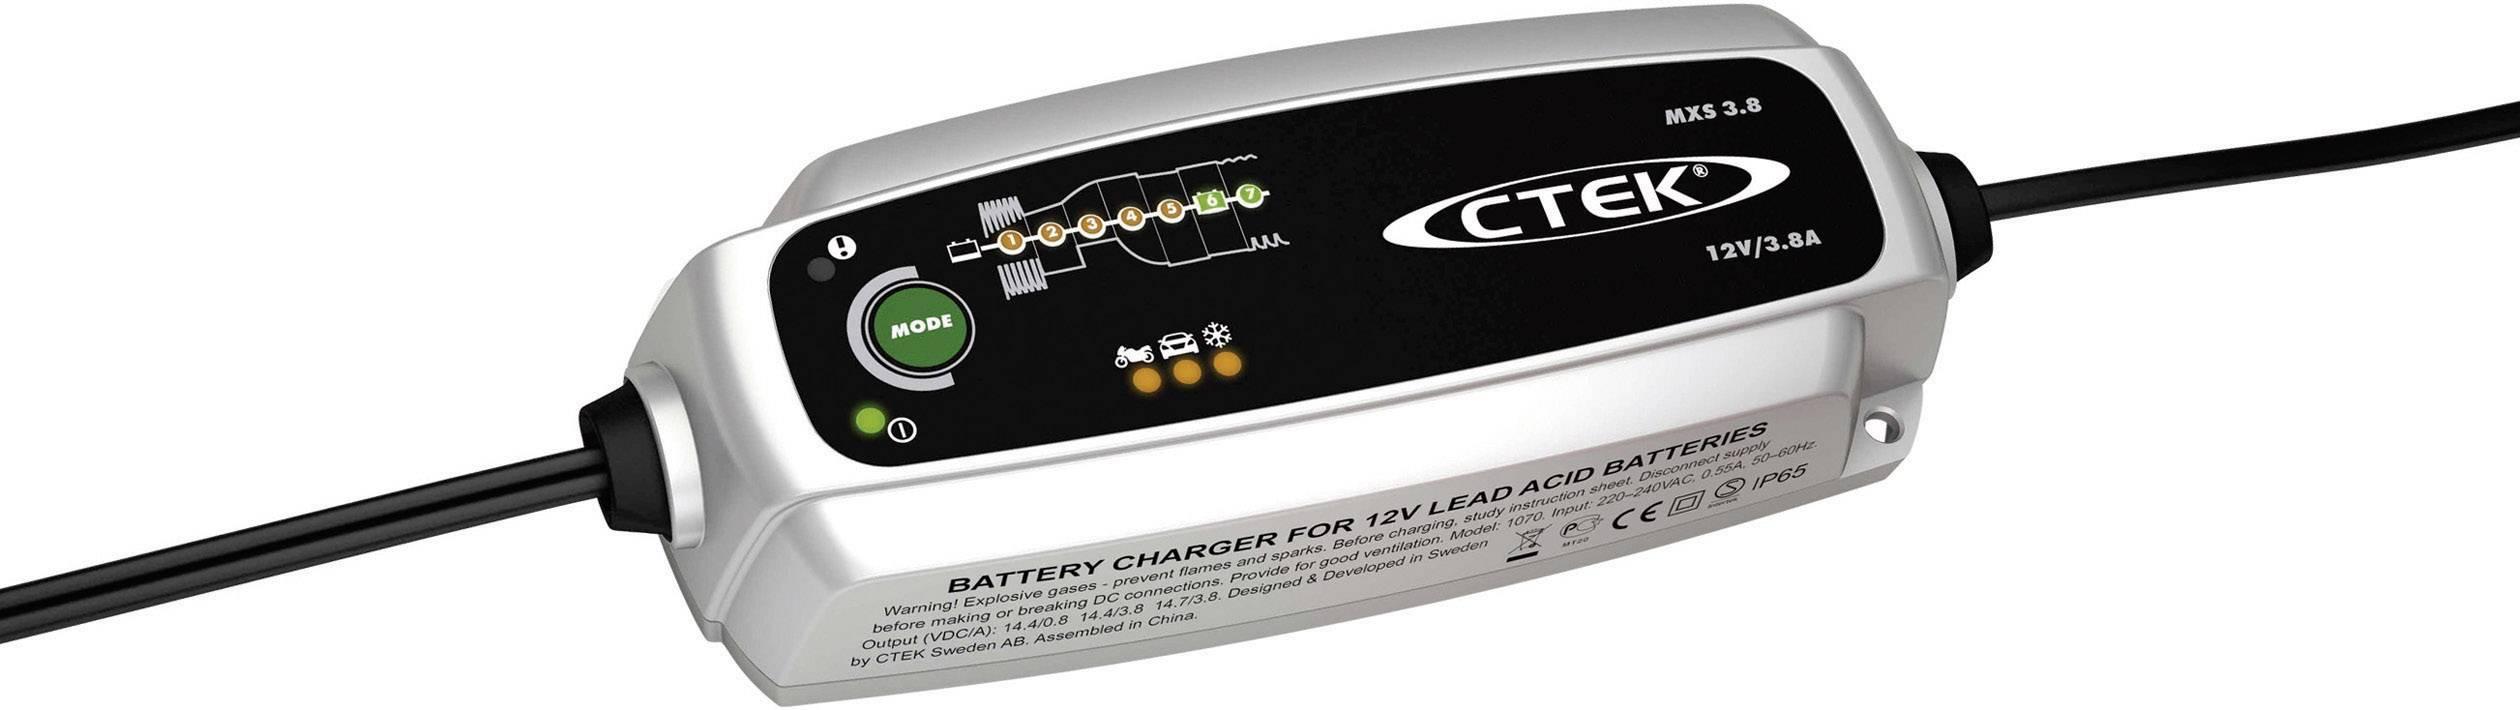 Nabíjačka autobatérie CTEK MXS 3.8 56-309, 12 V, 3.8 A